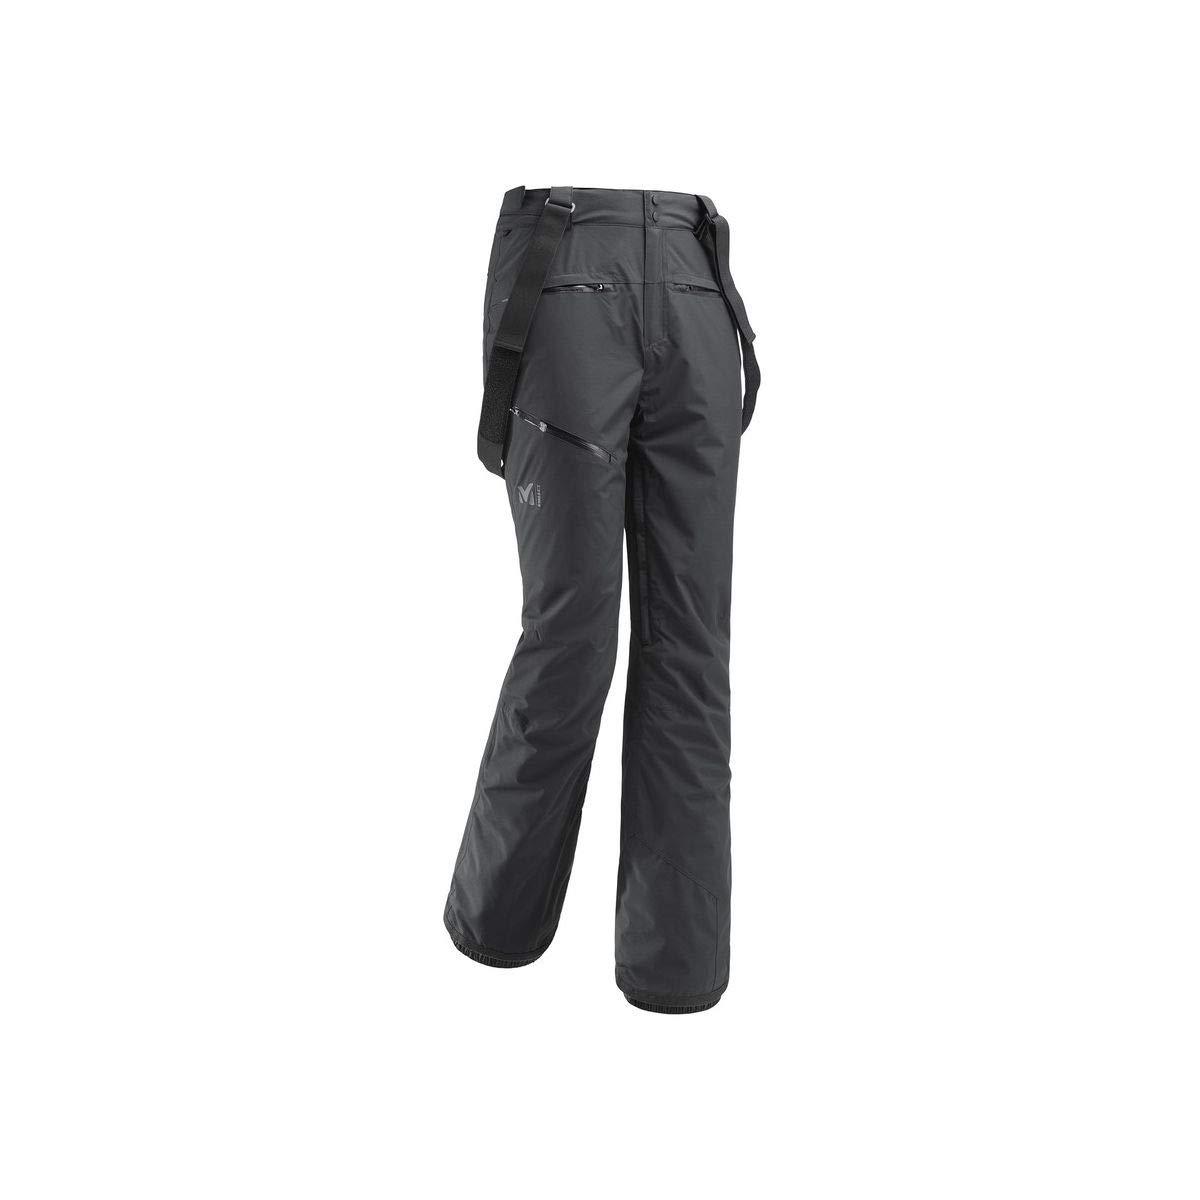 MILLET atna Peak Pantaloni da Sci Uomo MILA3|#Millet